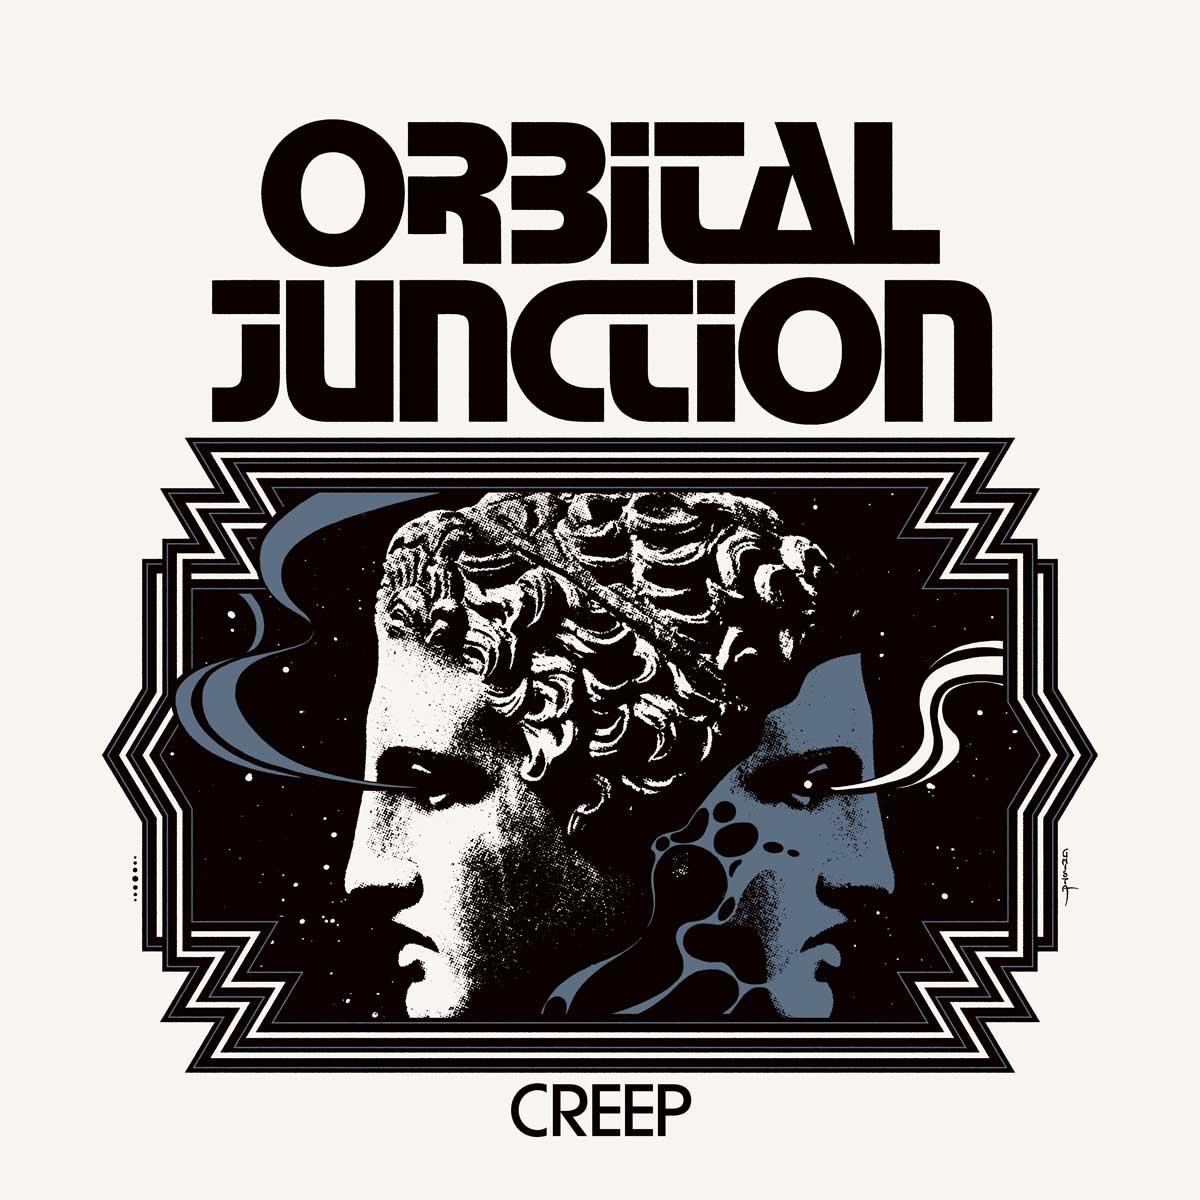 orbital junction creep